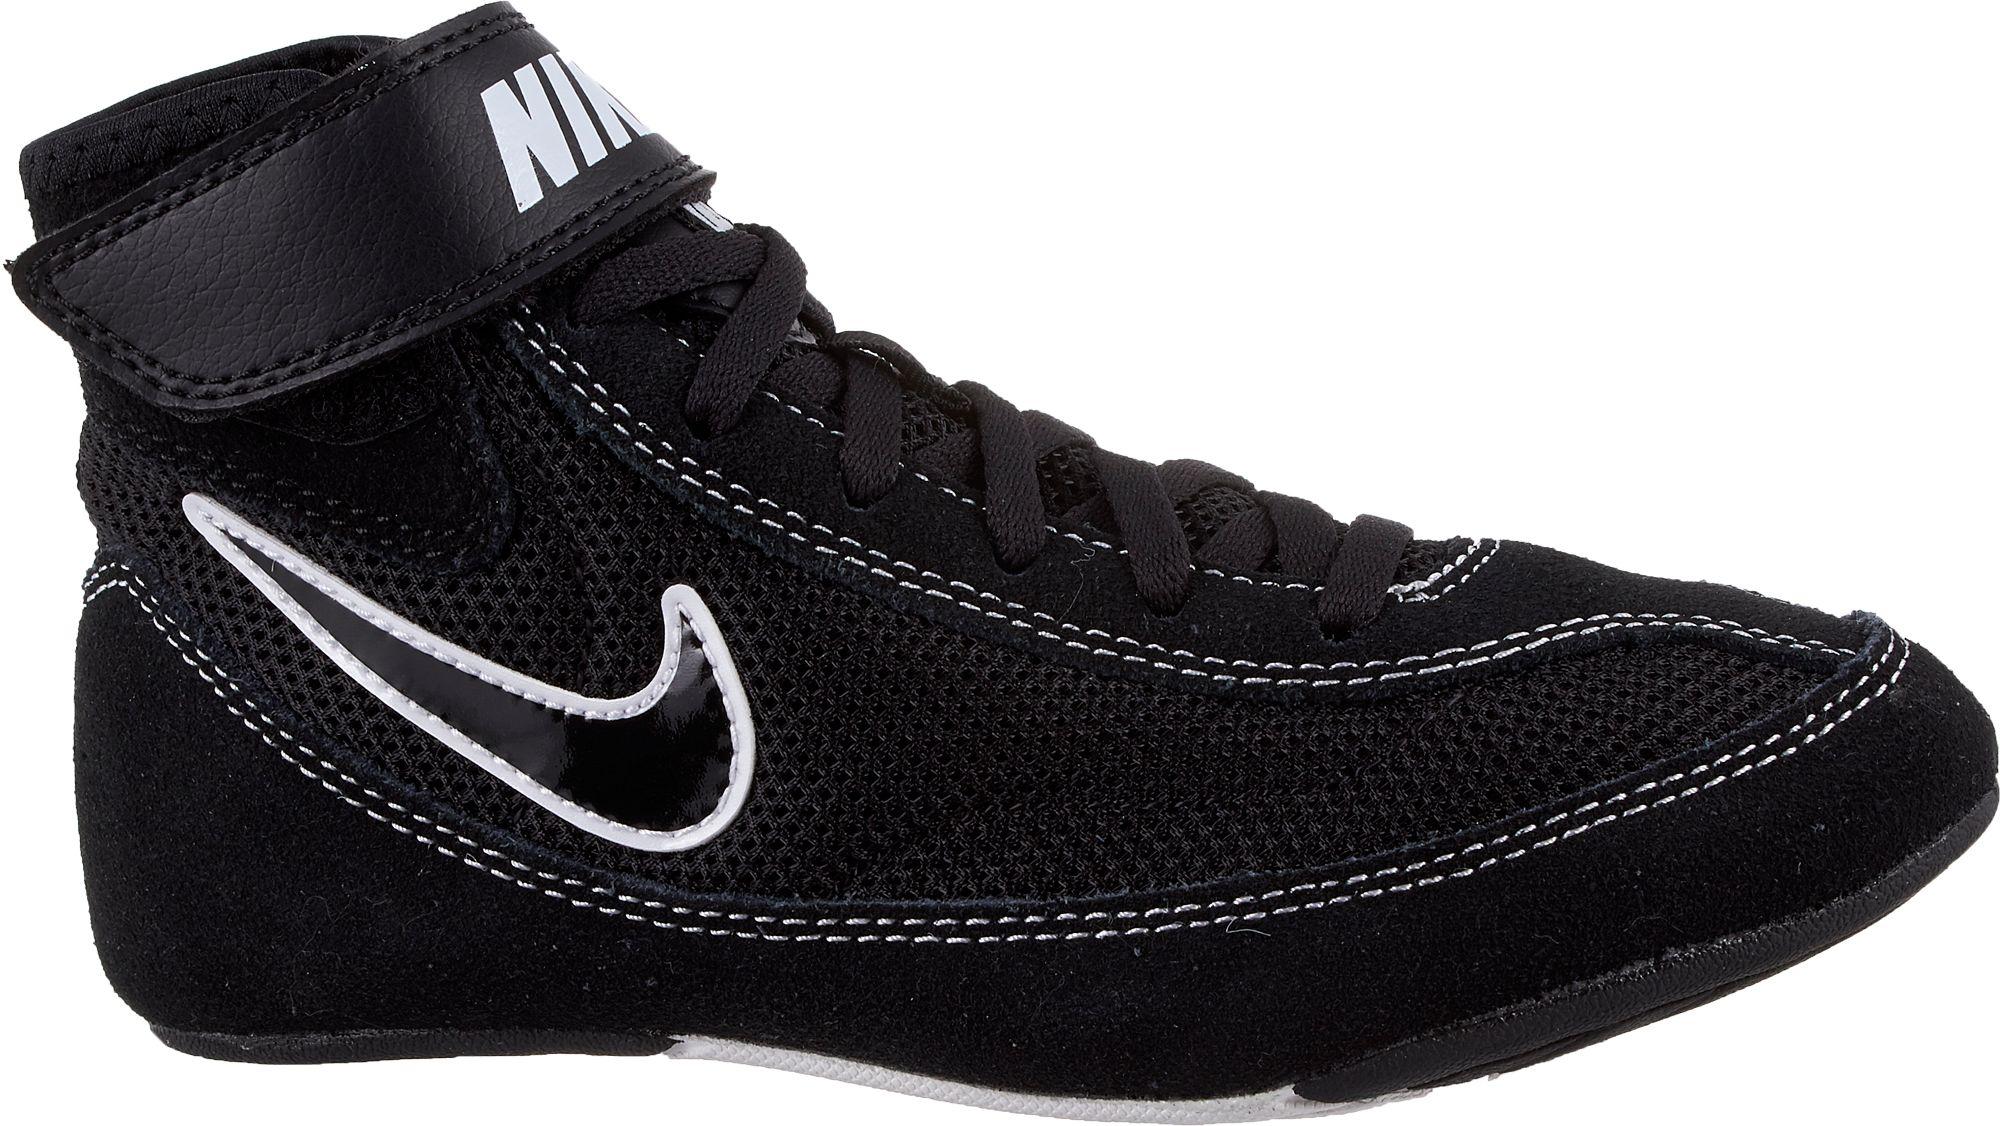 0d34a56da8529 Nike Kids' Speed Sweep VII Wrestling Shoes